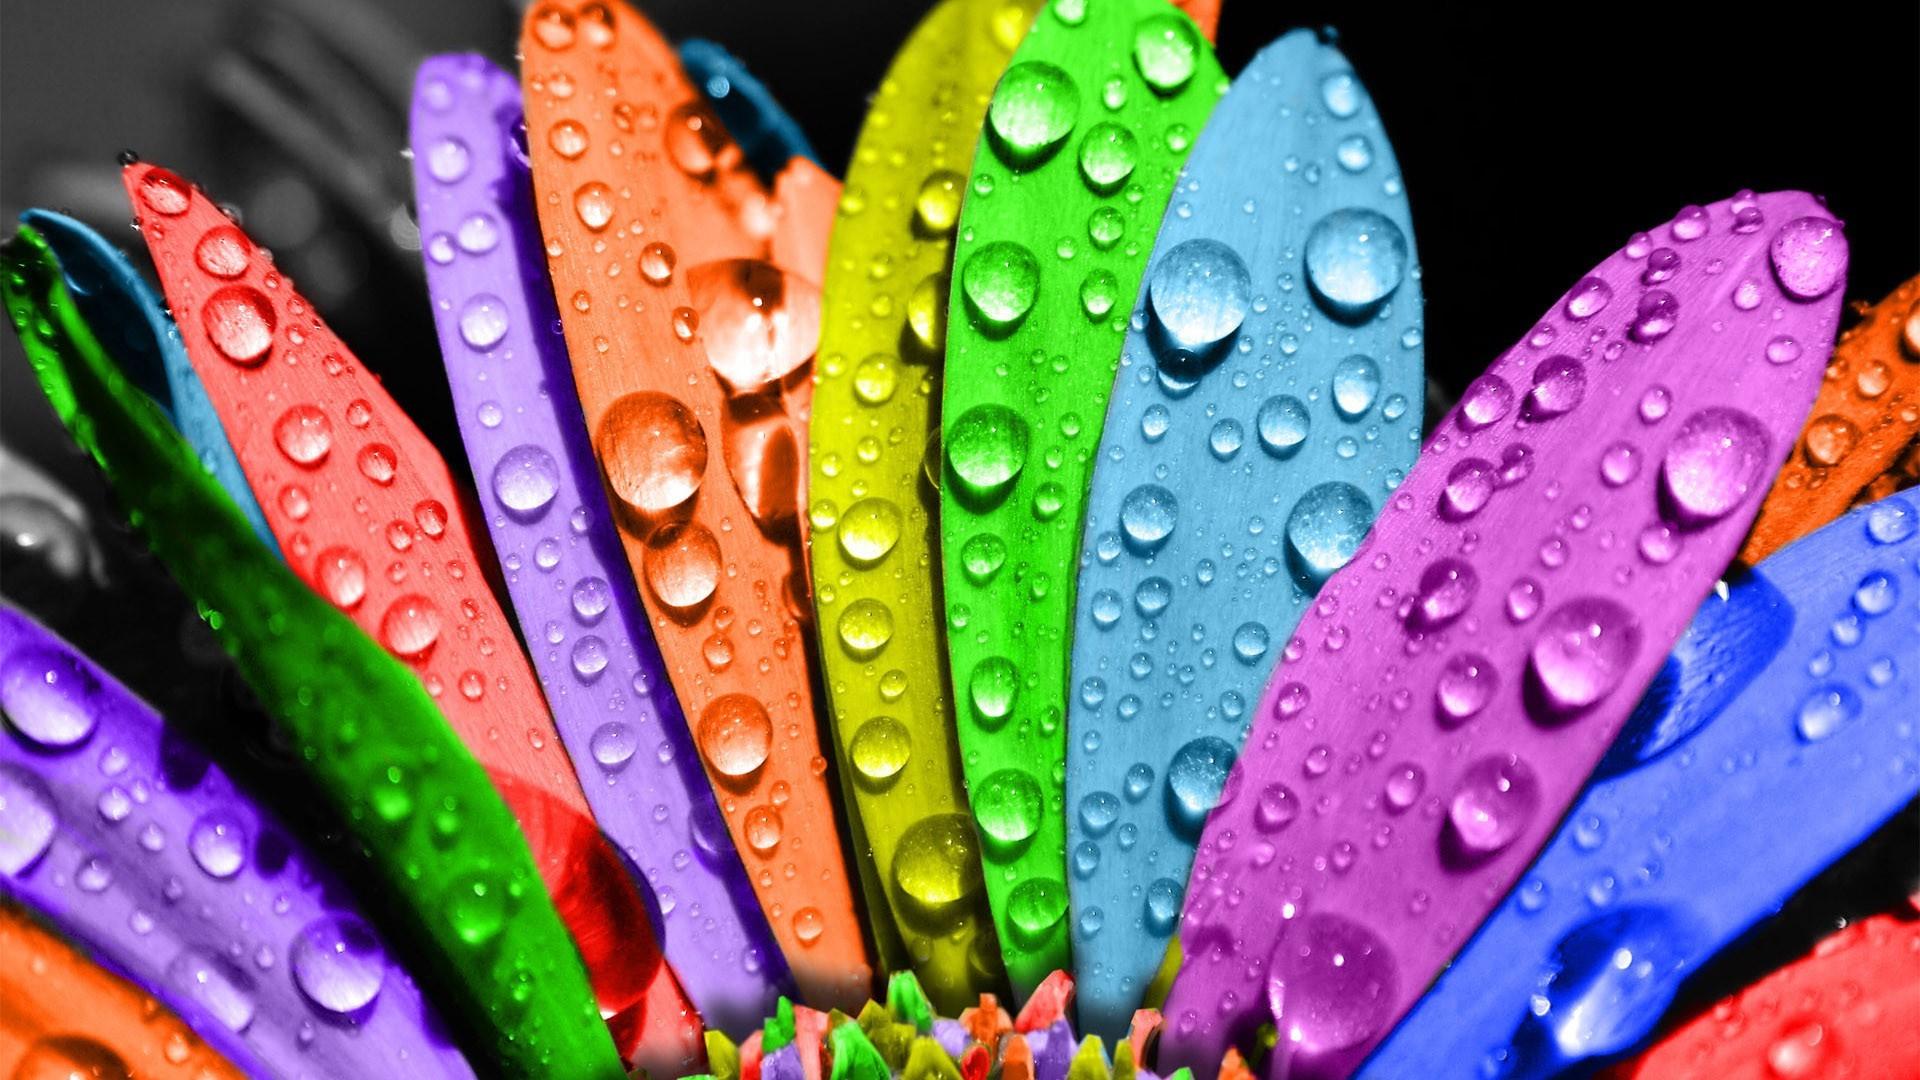 Cute Colorful Wallpaper 15113